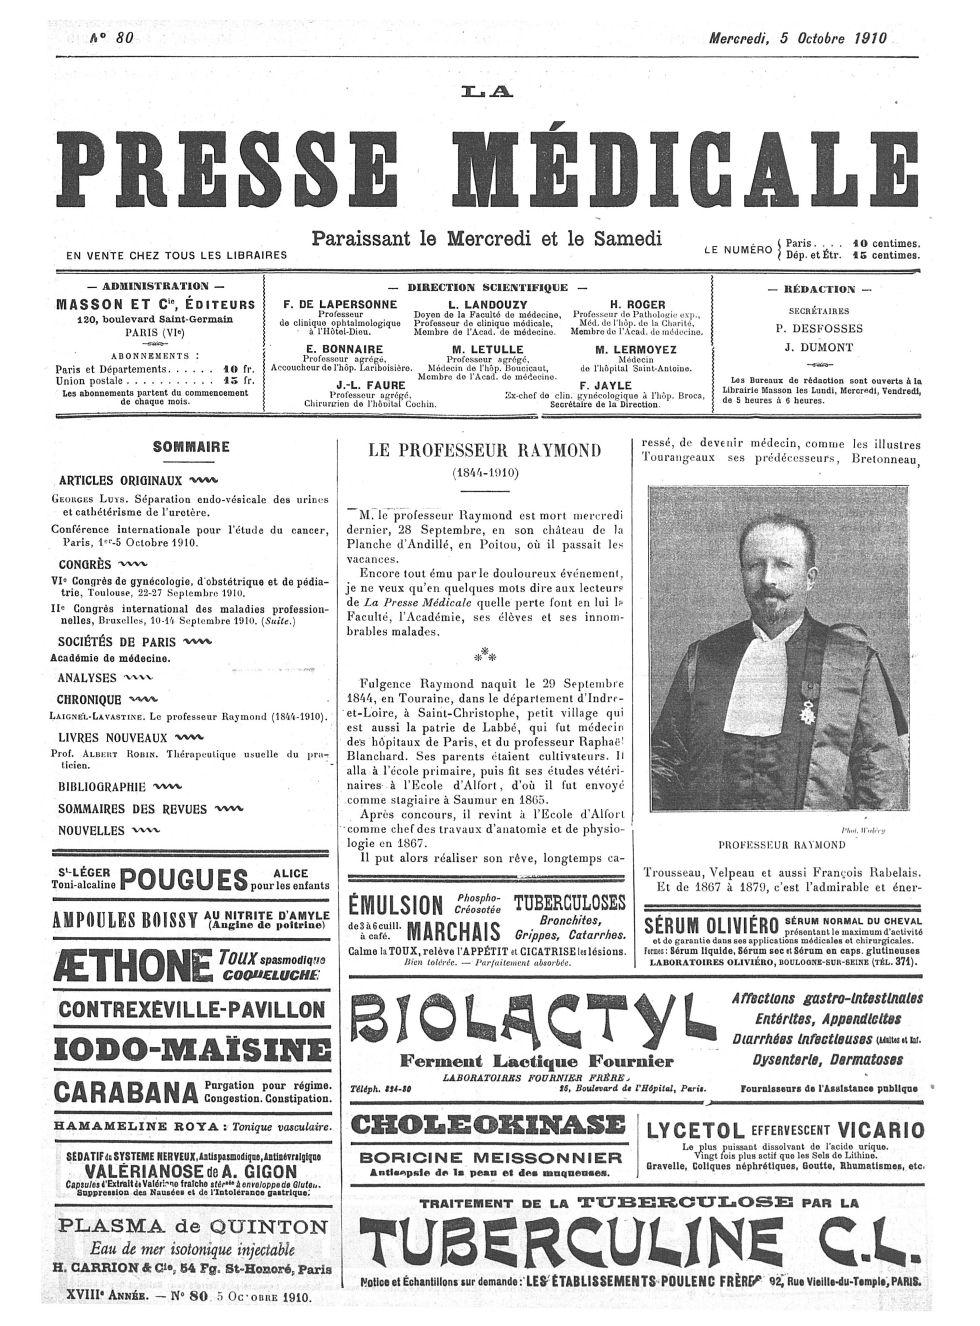 Professeur Raymond - La Presse médicale - [Volume d'annexes] -  - med100000x1910xannexesx0801